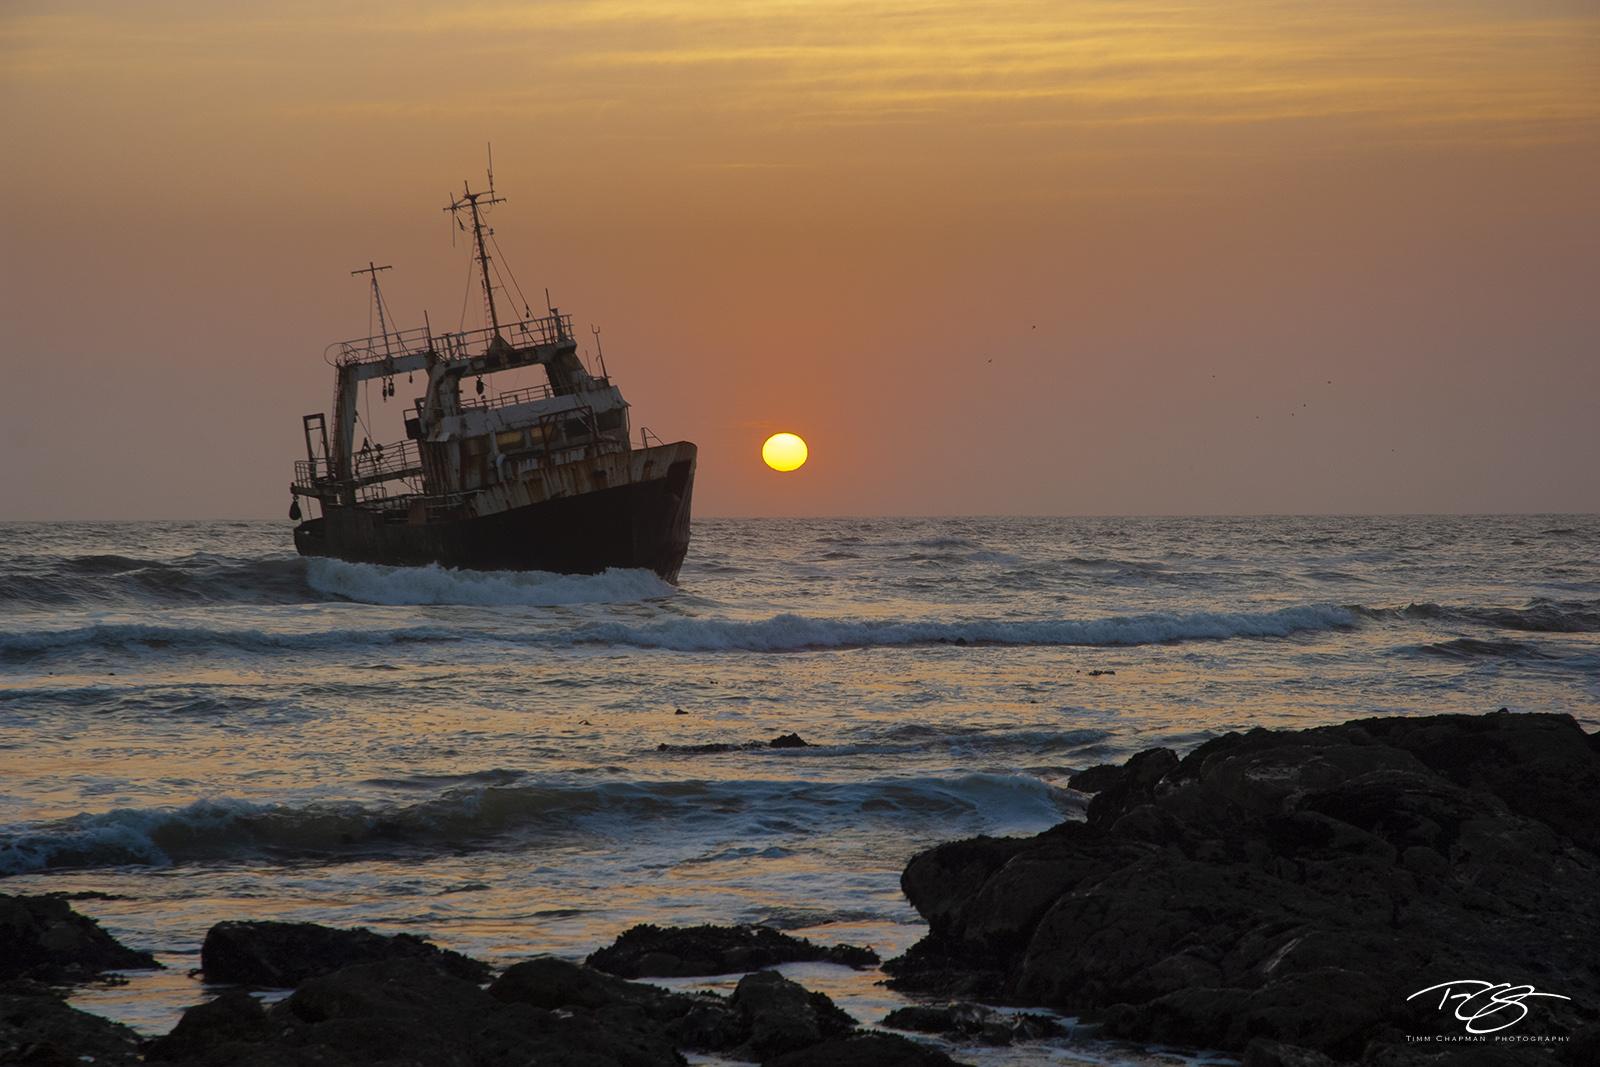 despair, red sky at night, shipwreck, nautical wreckage, sunset, red skies, helpless, treacherous seas, run aground, listing, salvage, skeleton coast, namibia, benguela current, desolate, nautical, photo